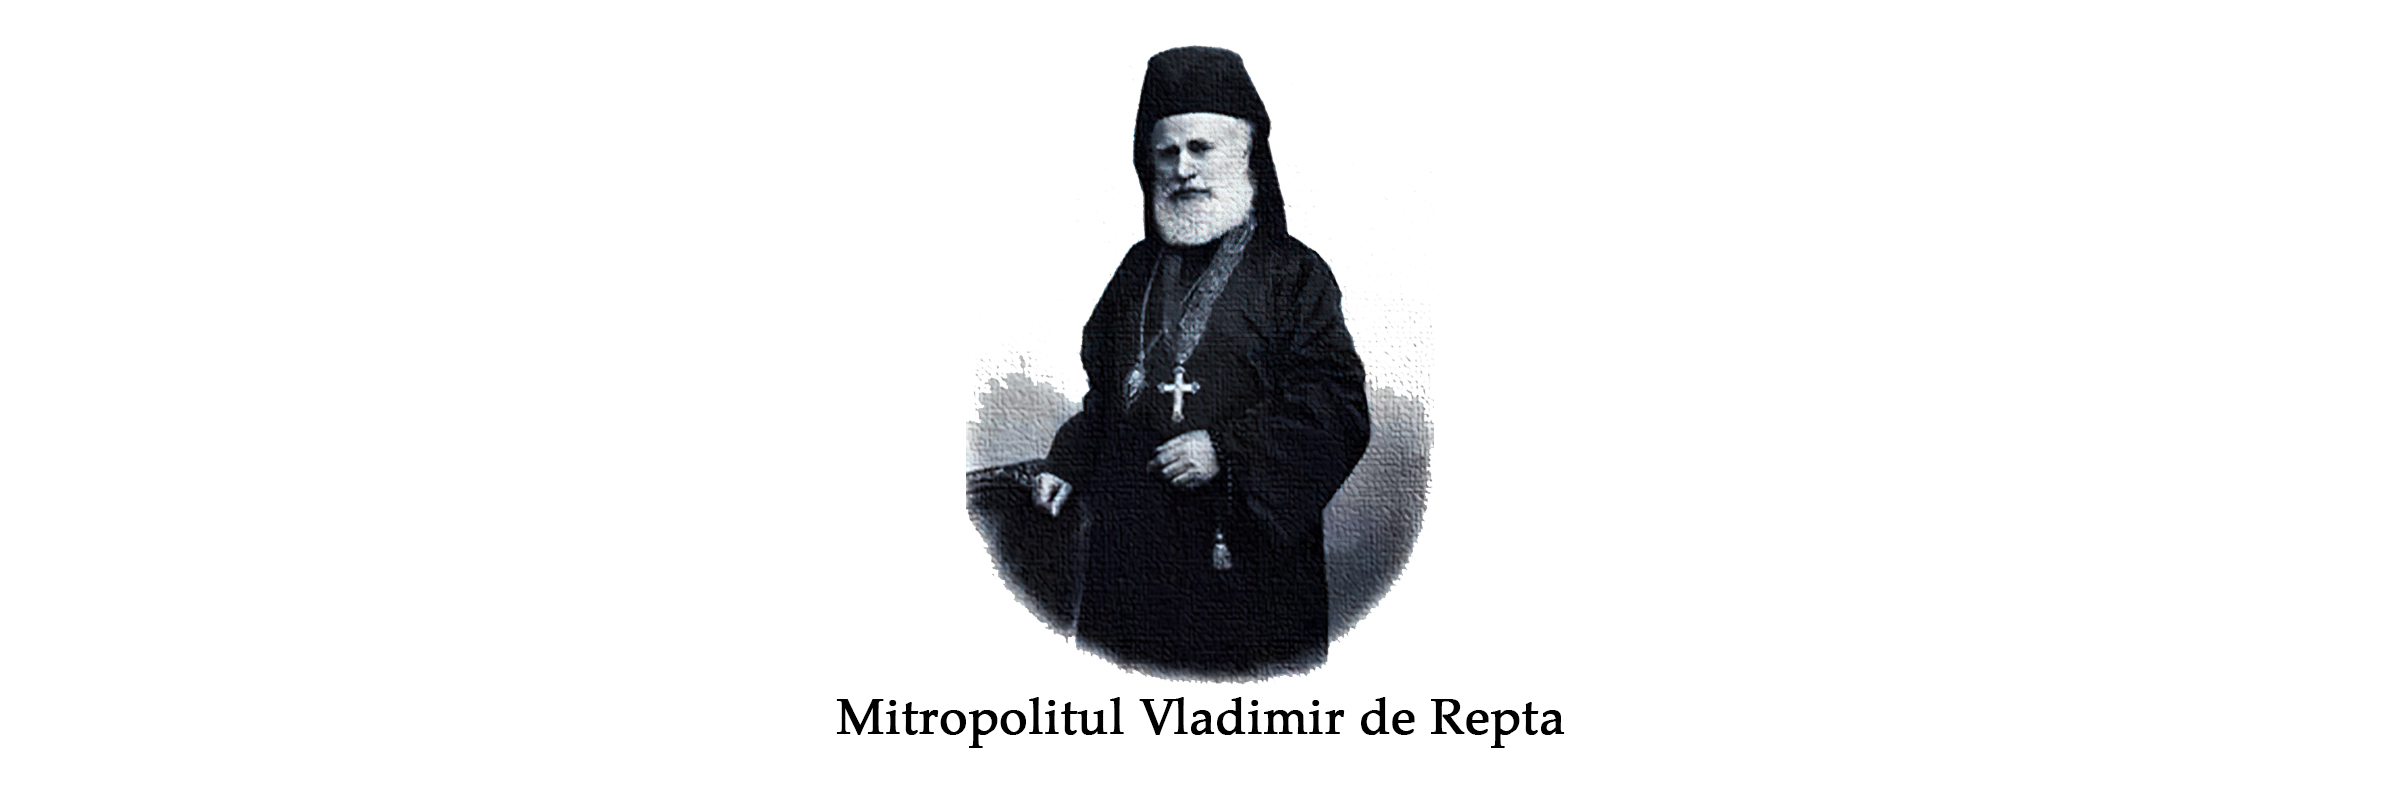 vladimir_de_repta_site